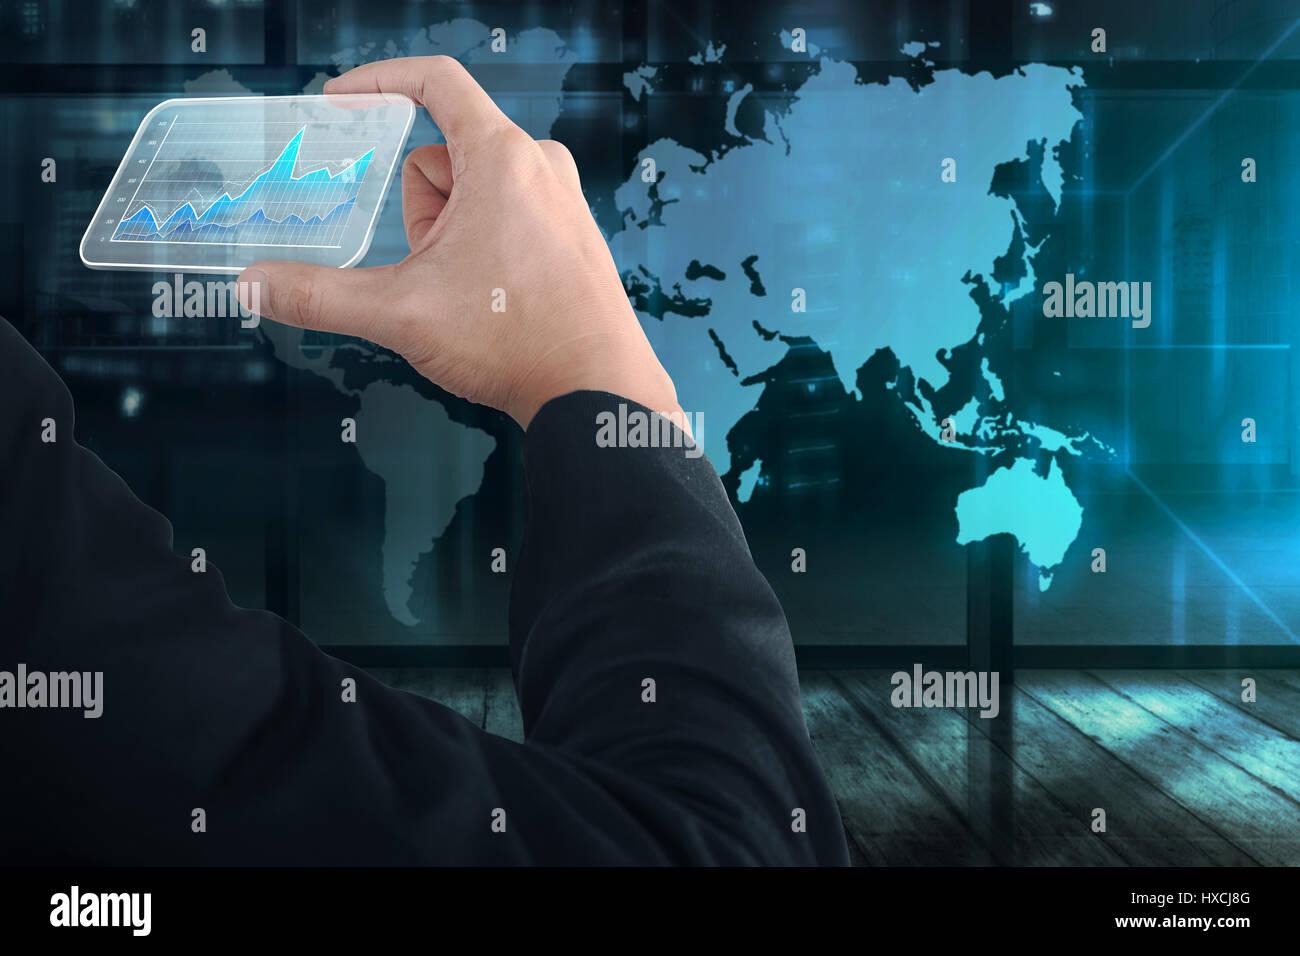 Geschäft Leute Hand Hält Virtuelle Visitenkarte Mit Digital